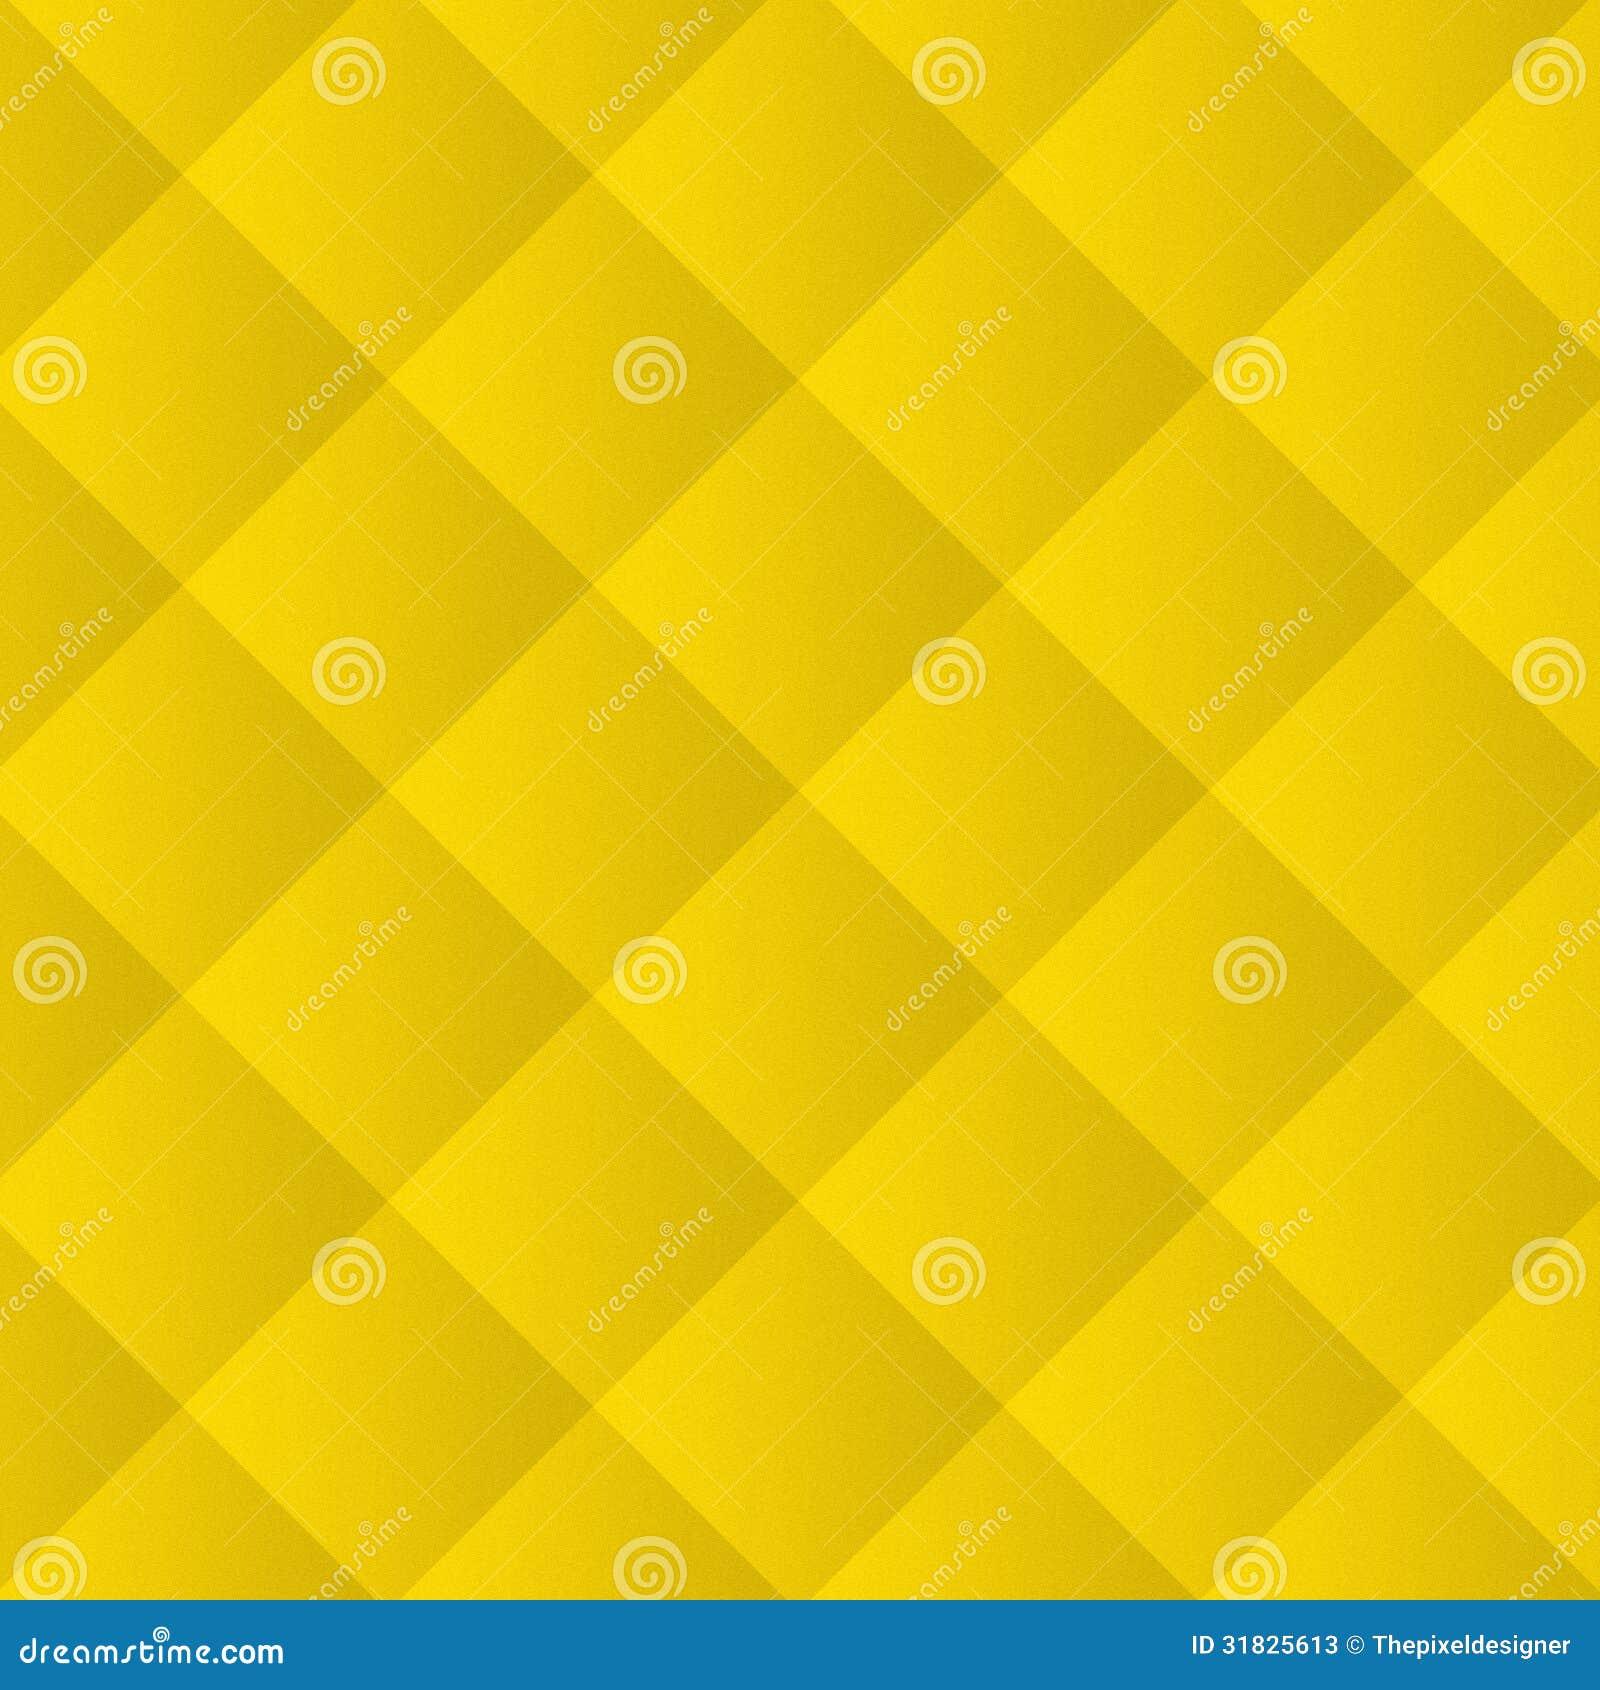 Yellow, Orange Background Abstract Stock Illustration